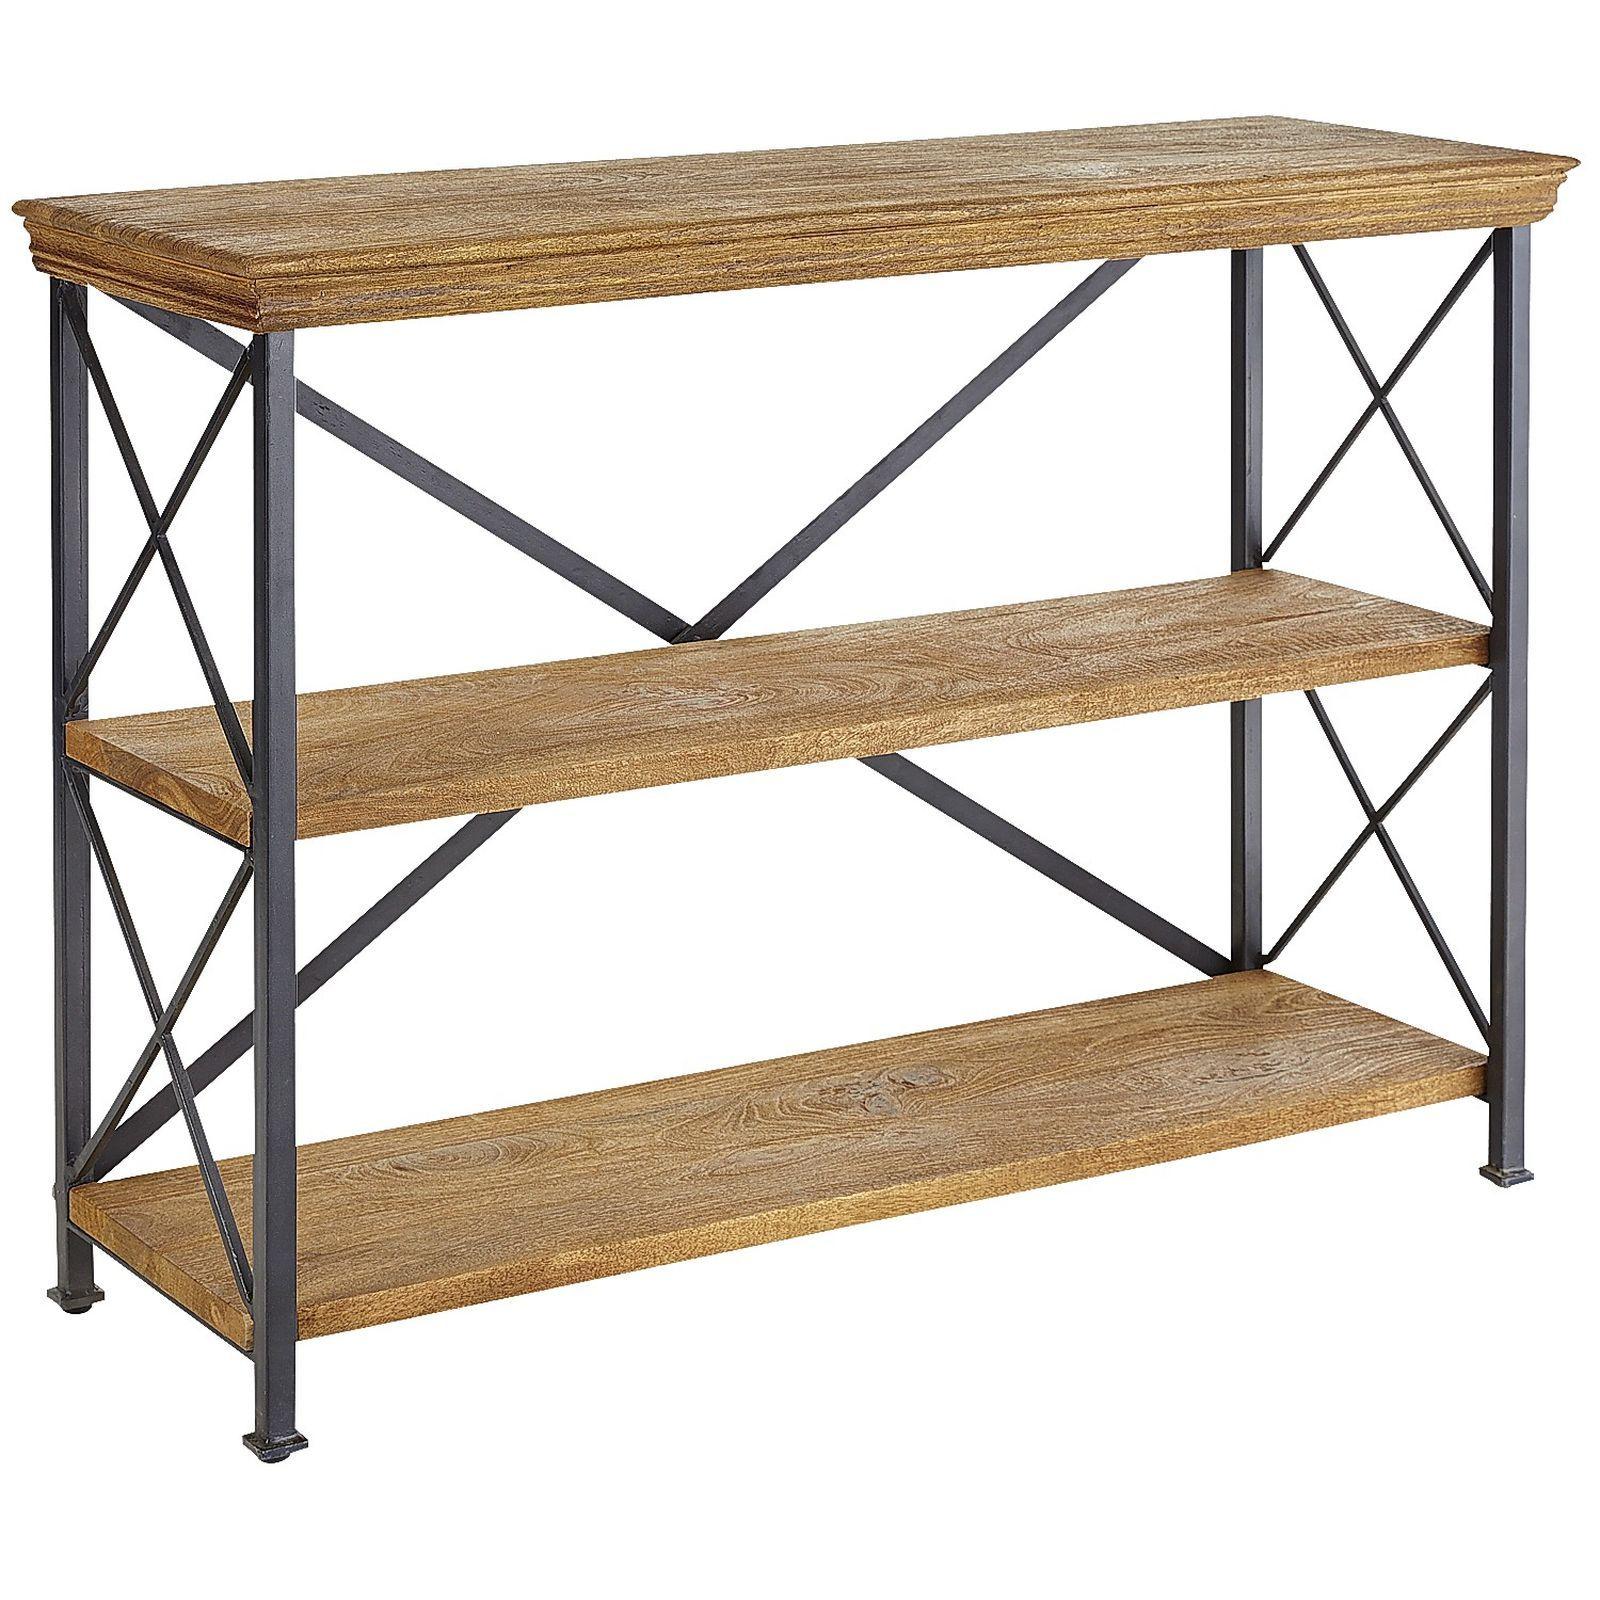 Metro Weathered Java Low Shelf Metal Shelves Shelves Low Shelves